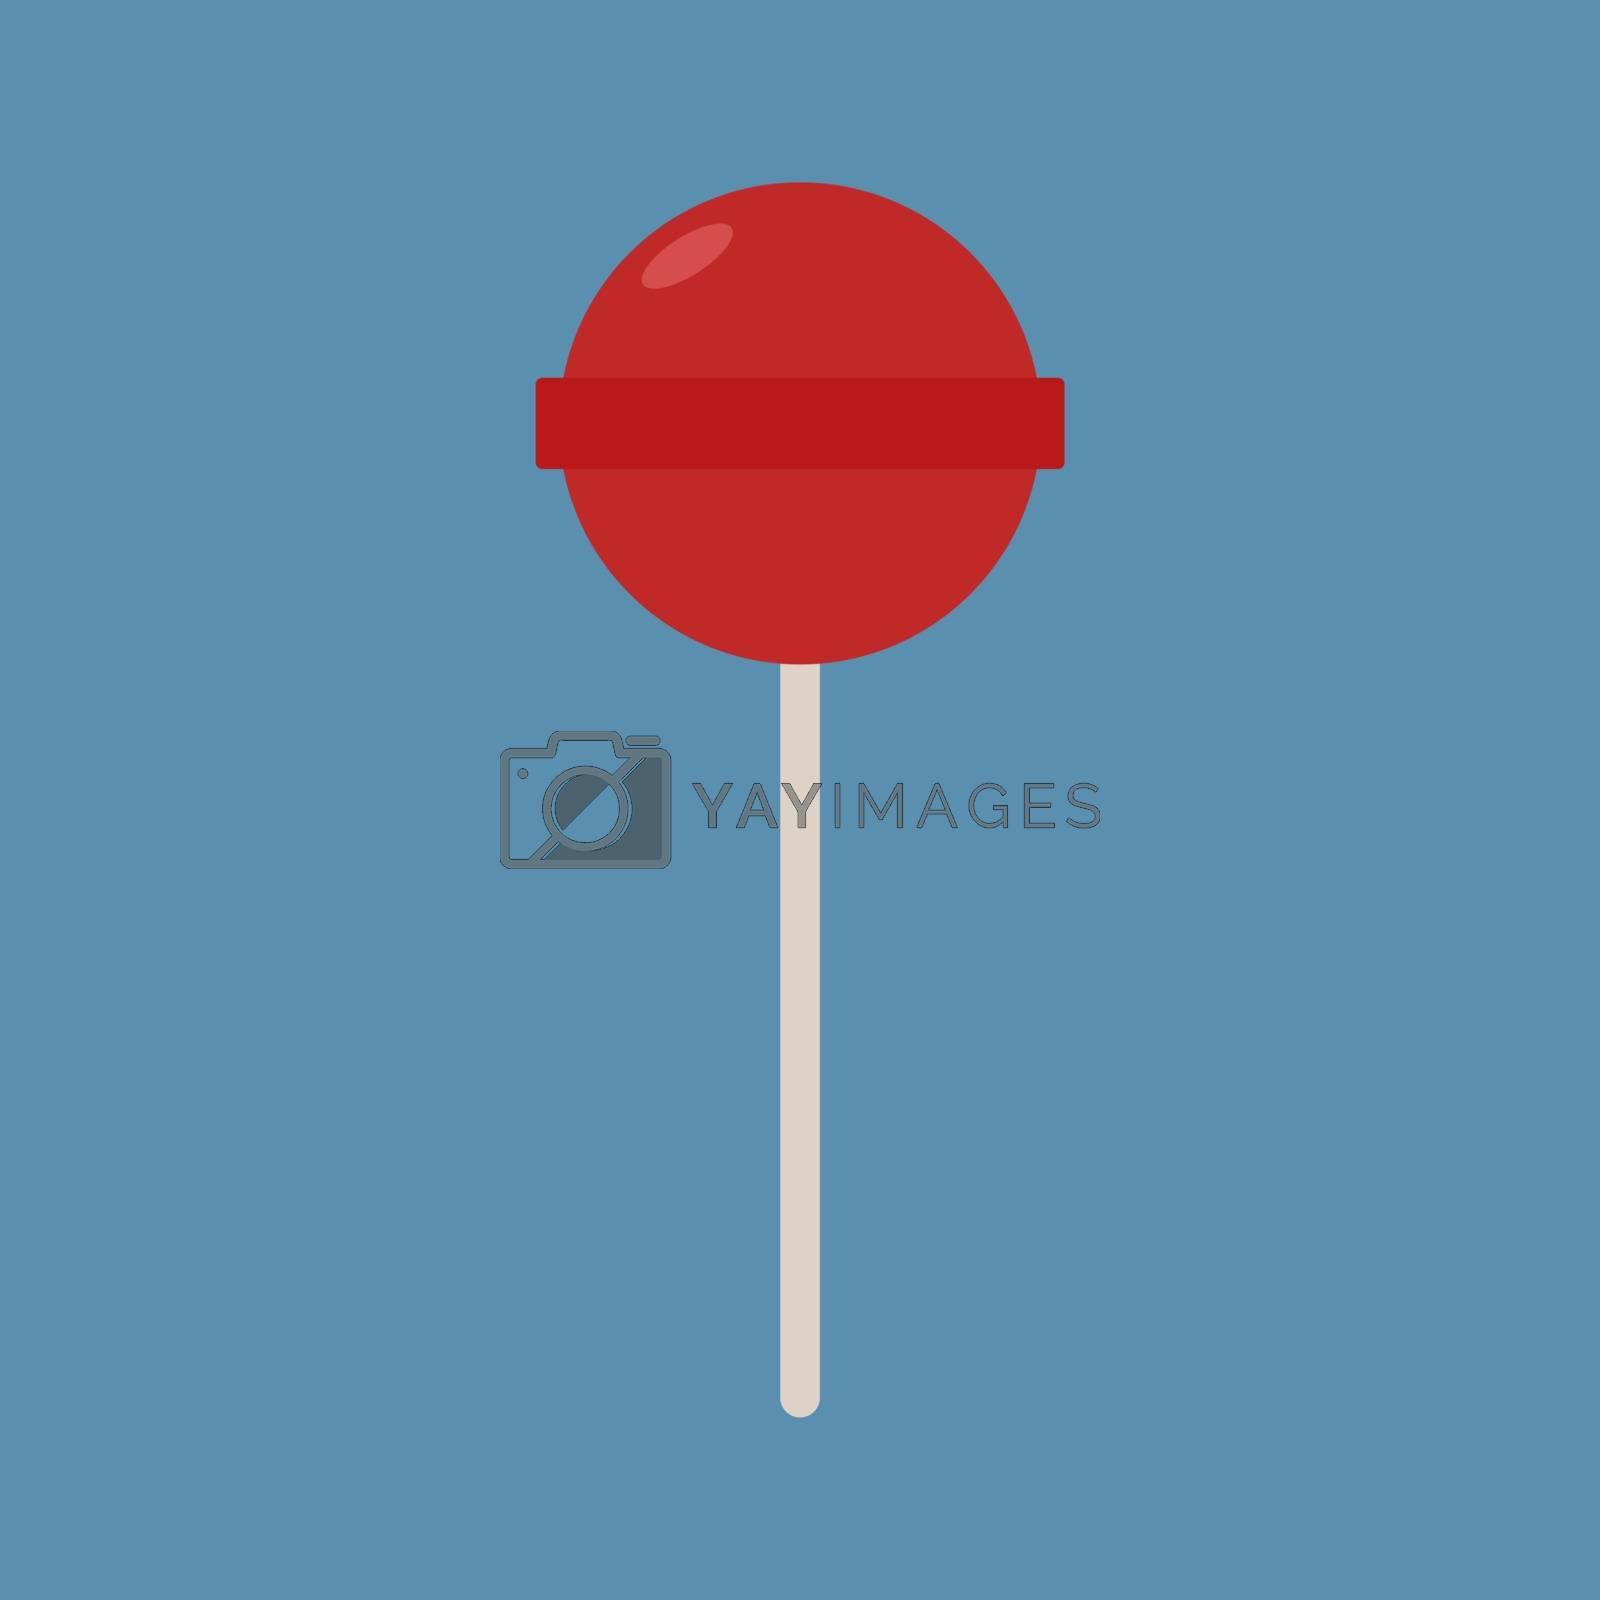 Lollipop, illustration, vector on white background.